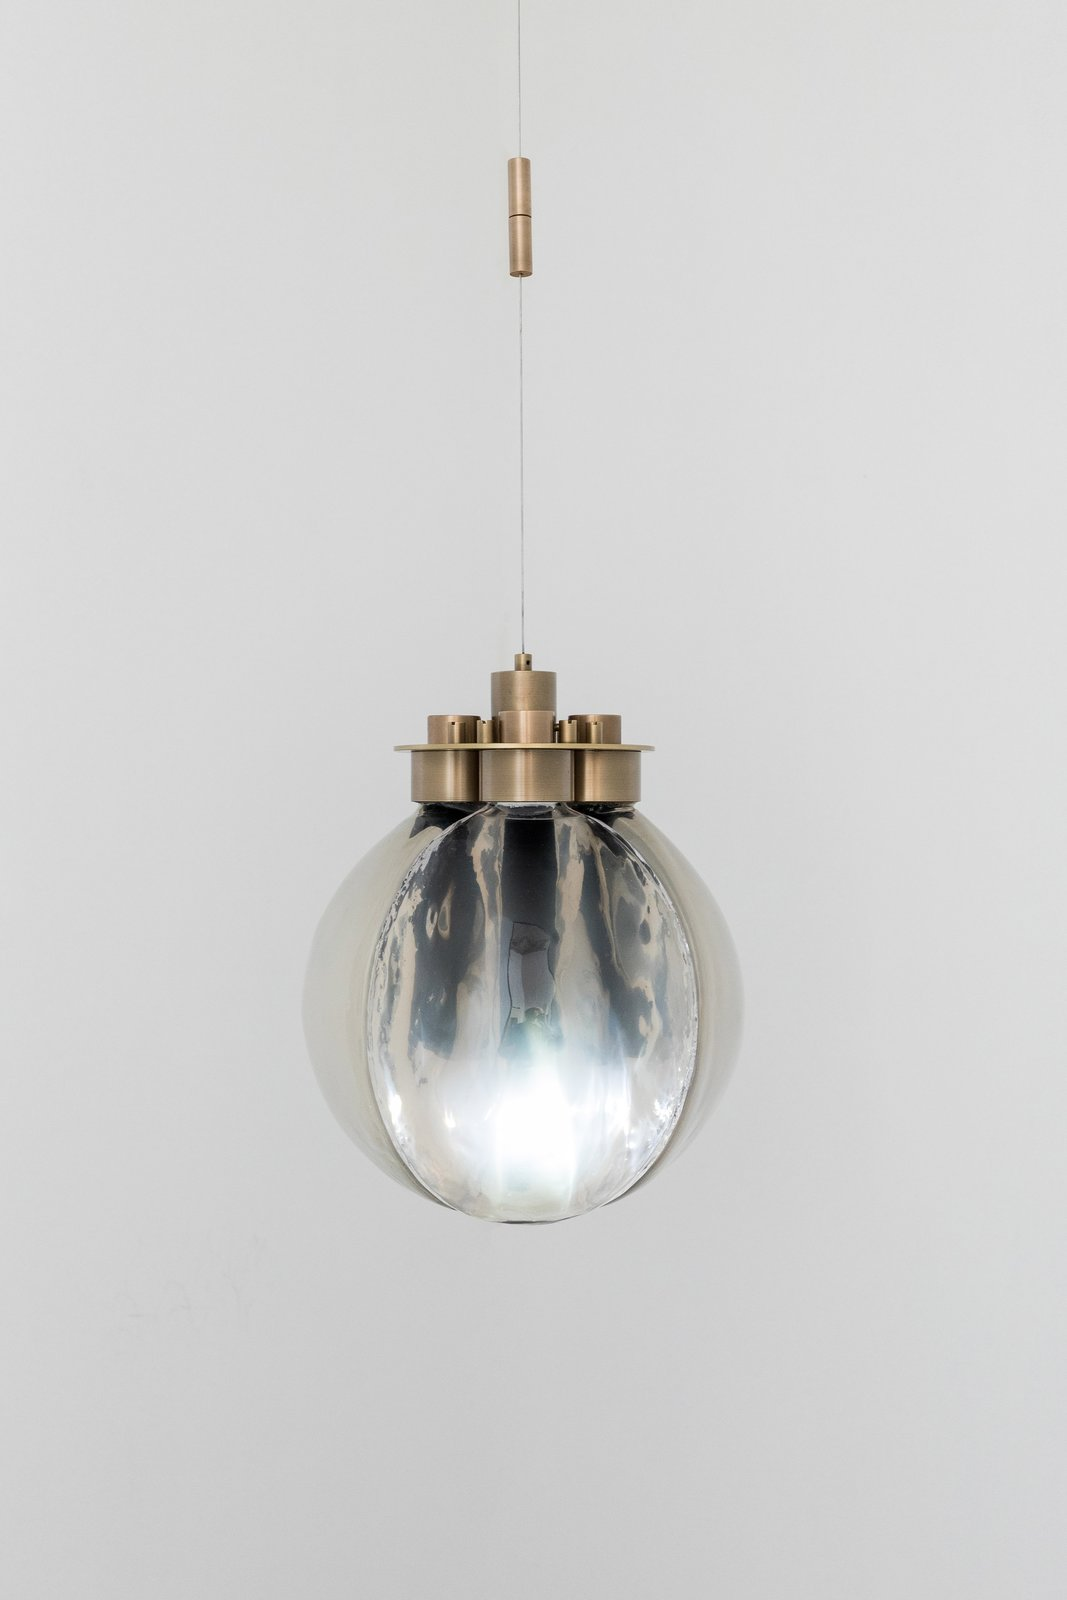 Spark of Life by Teresa van Dongen  Photo 2 of 9 in 9 Innovative Light Fixtures That Combine Art, Design, and Technology